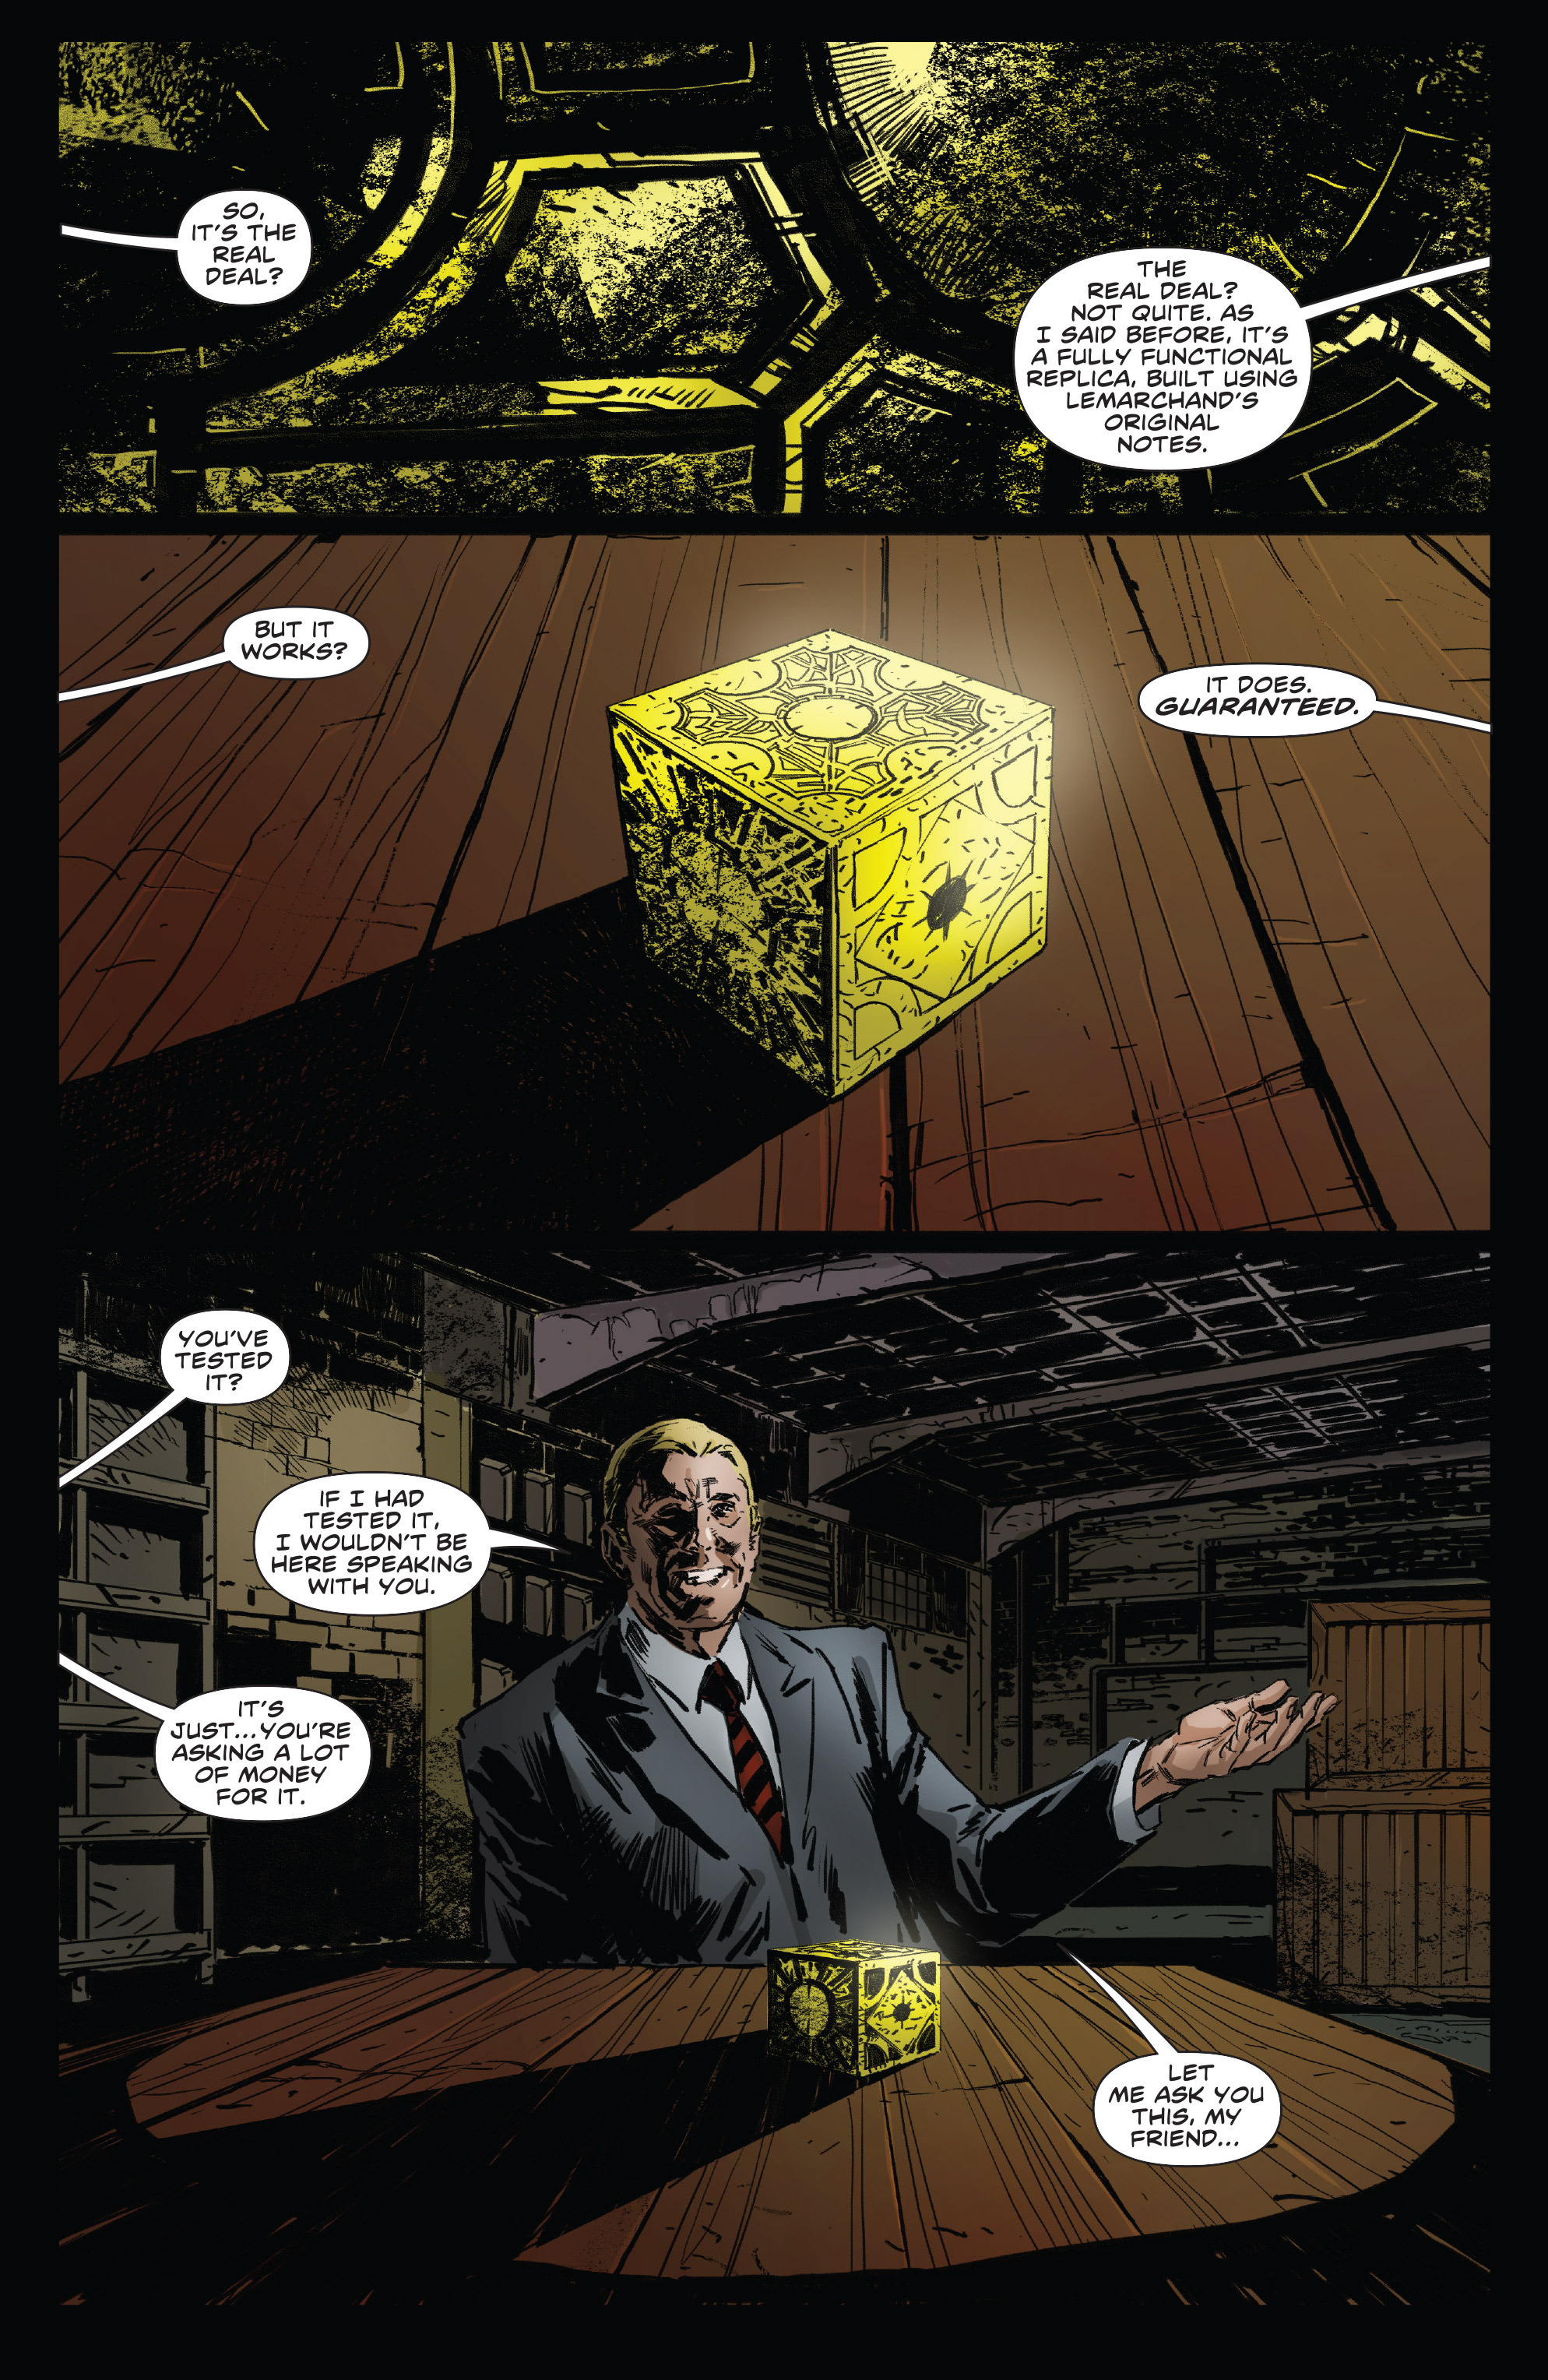 Read online Clive Barker's Hellraiser: The Dark Watch comic -  Issue # TPB 3 - 15